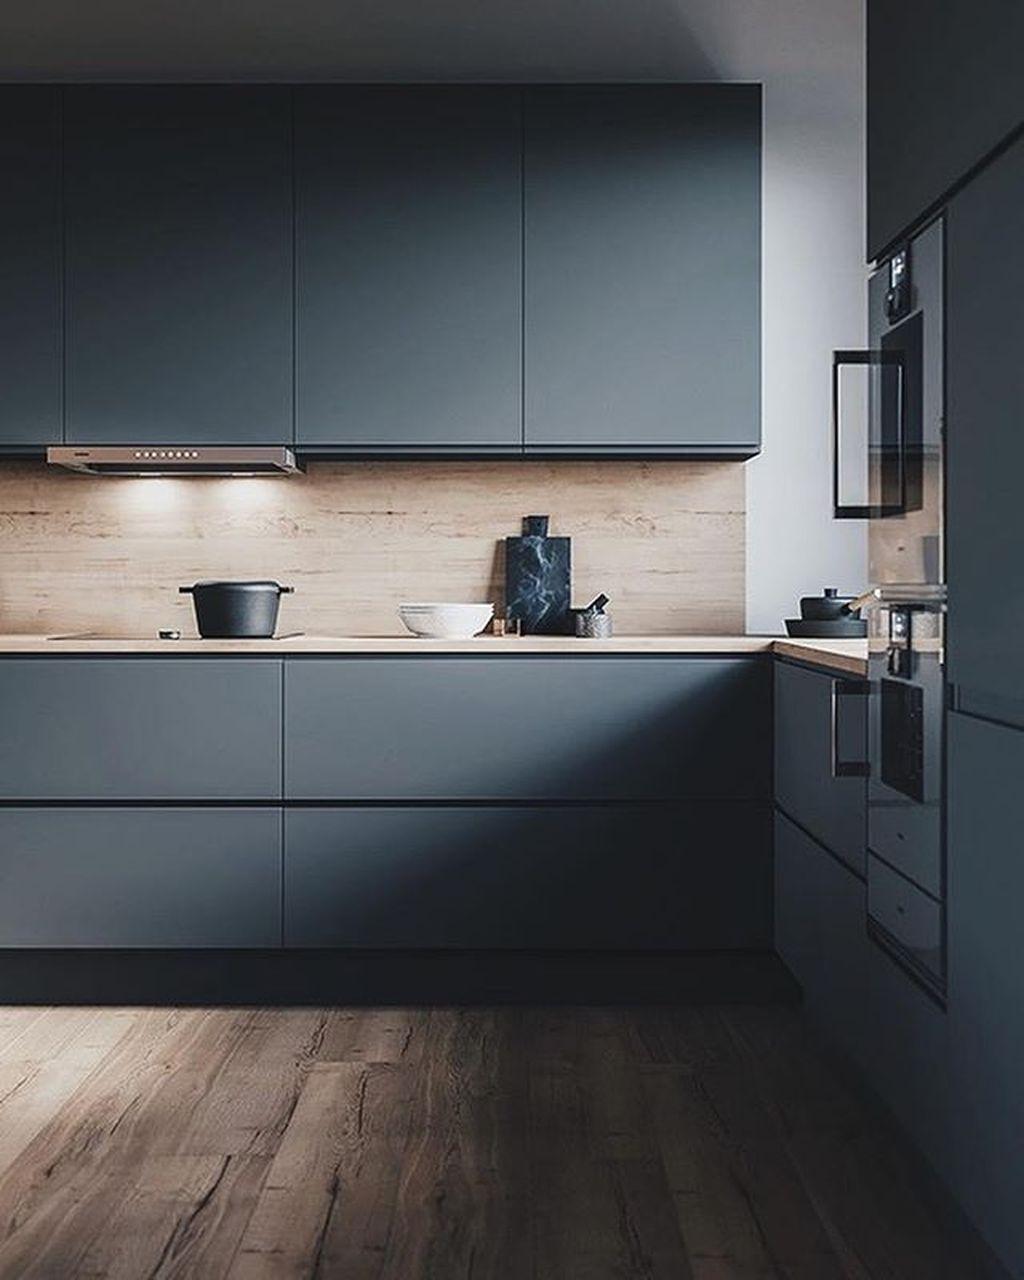 20 Elegant Black Kitchen Design Ideas You Need To Try Interior Design Kitchen Contemporary Kitchen Design Modern Kitchen Design